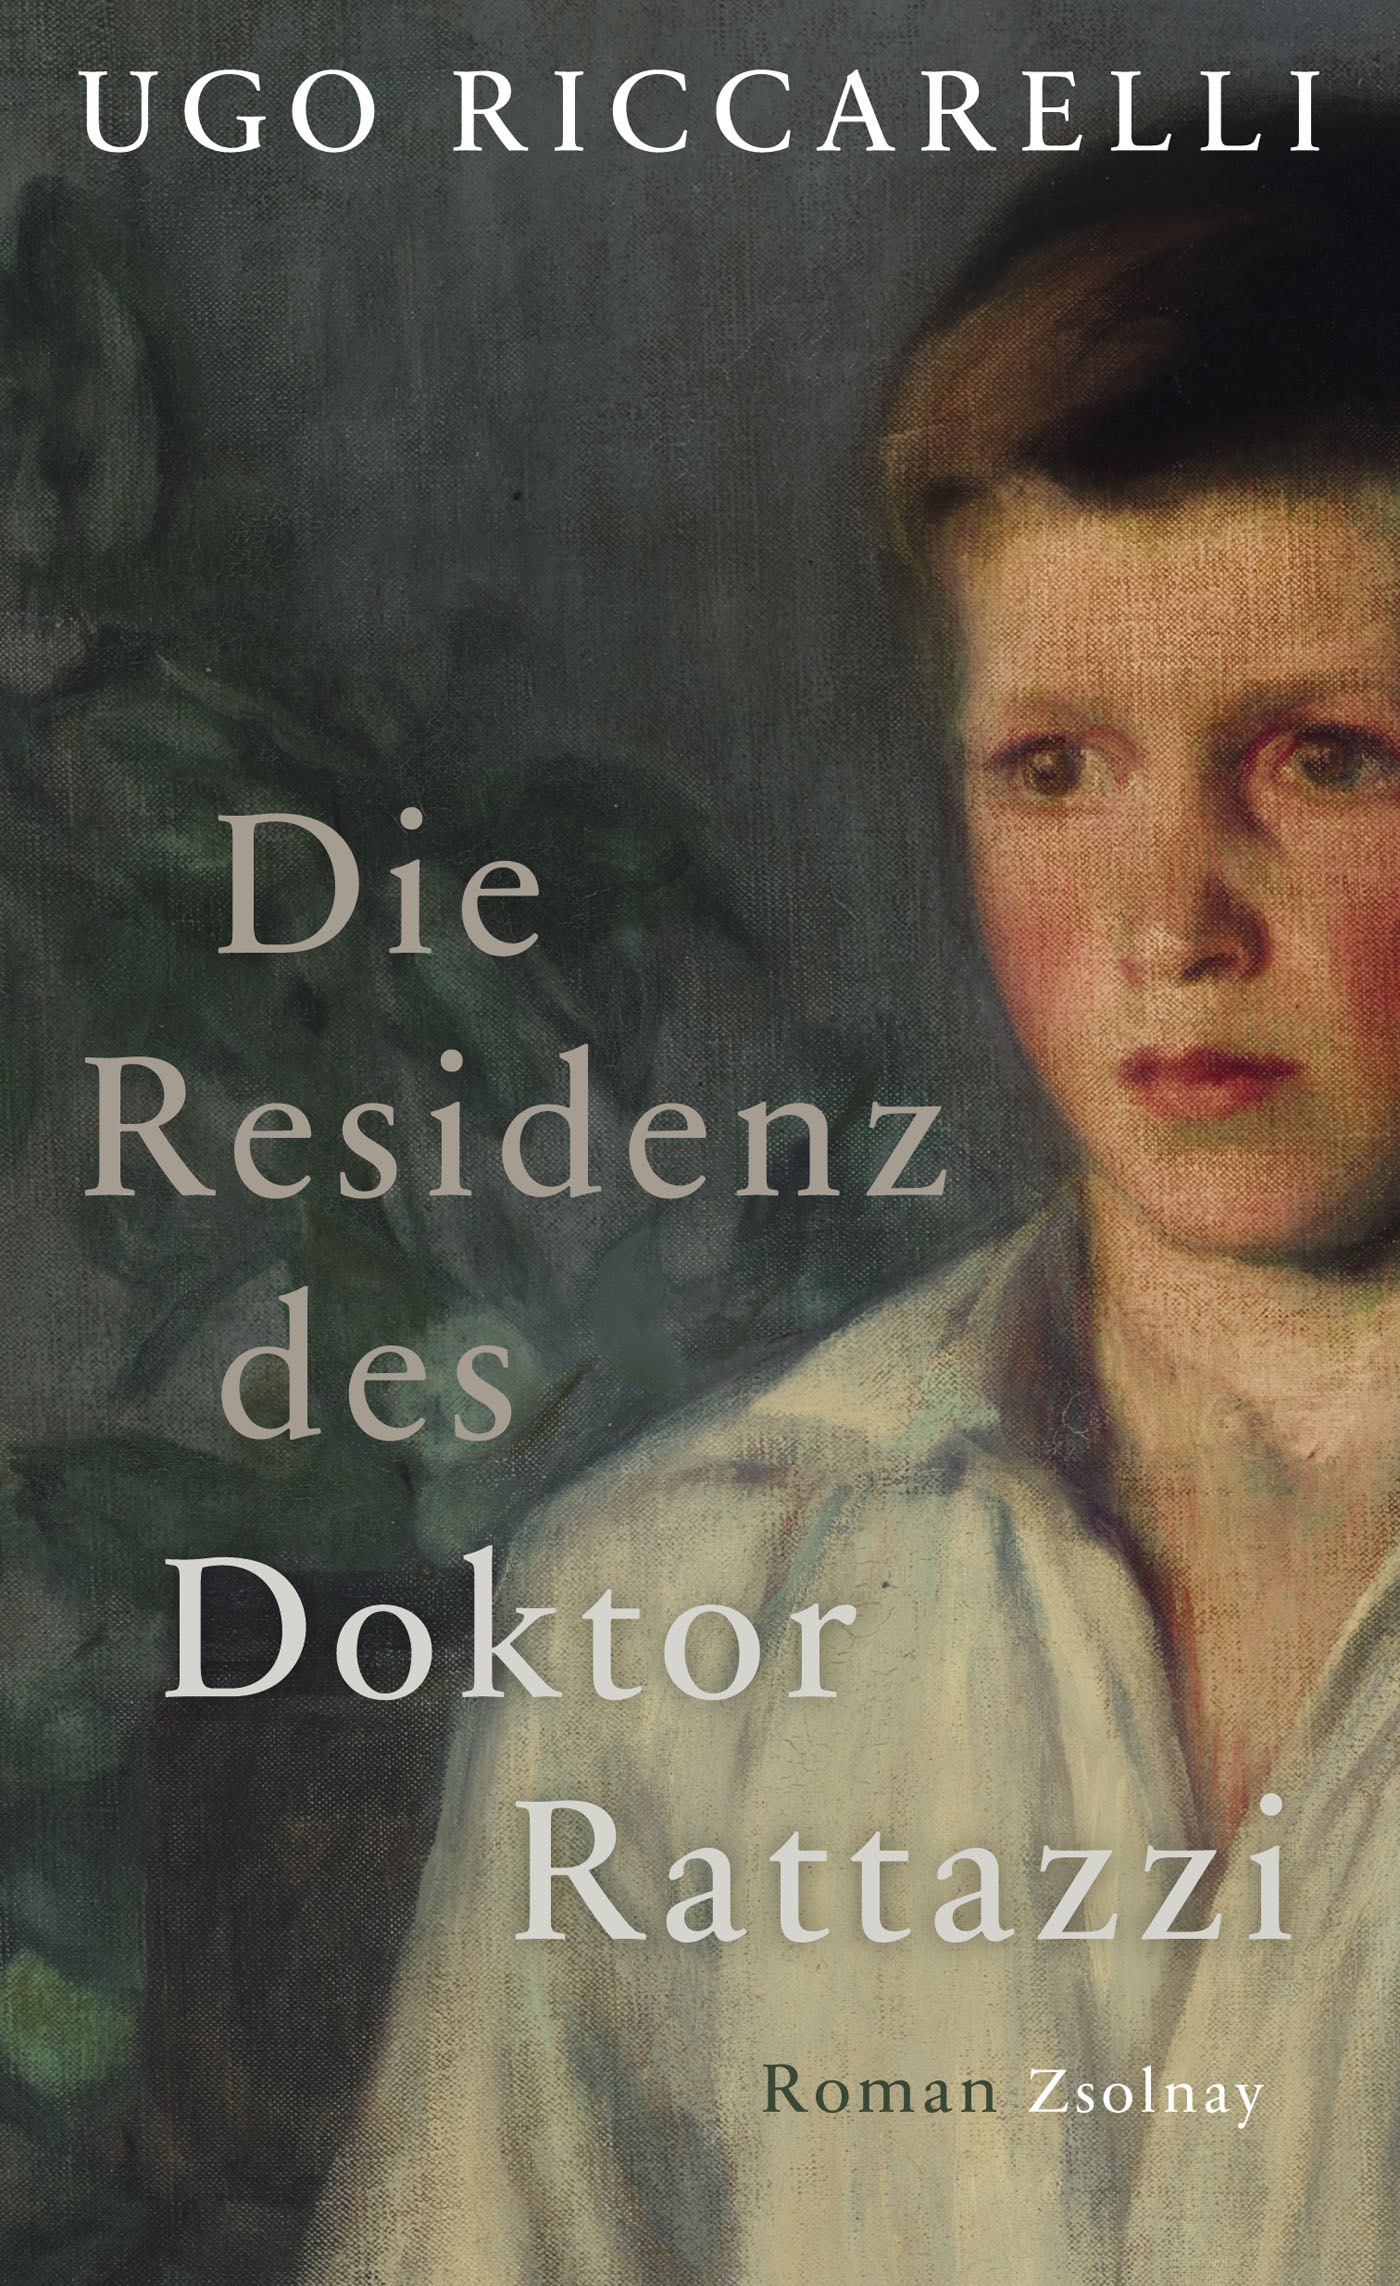 Die Residenz des Doktor Rattazzi - Ugo Riccarelli